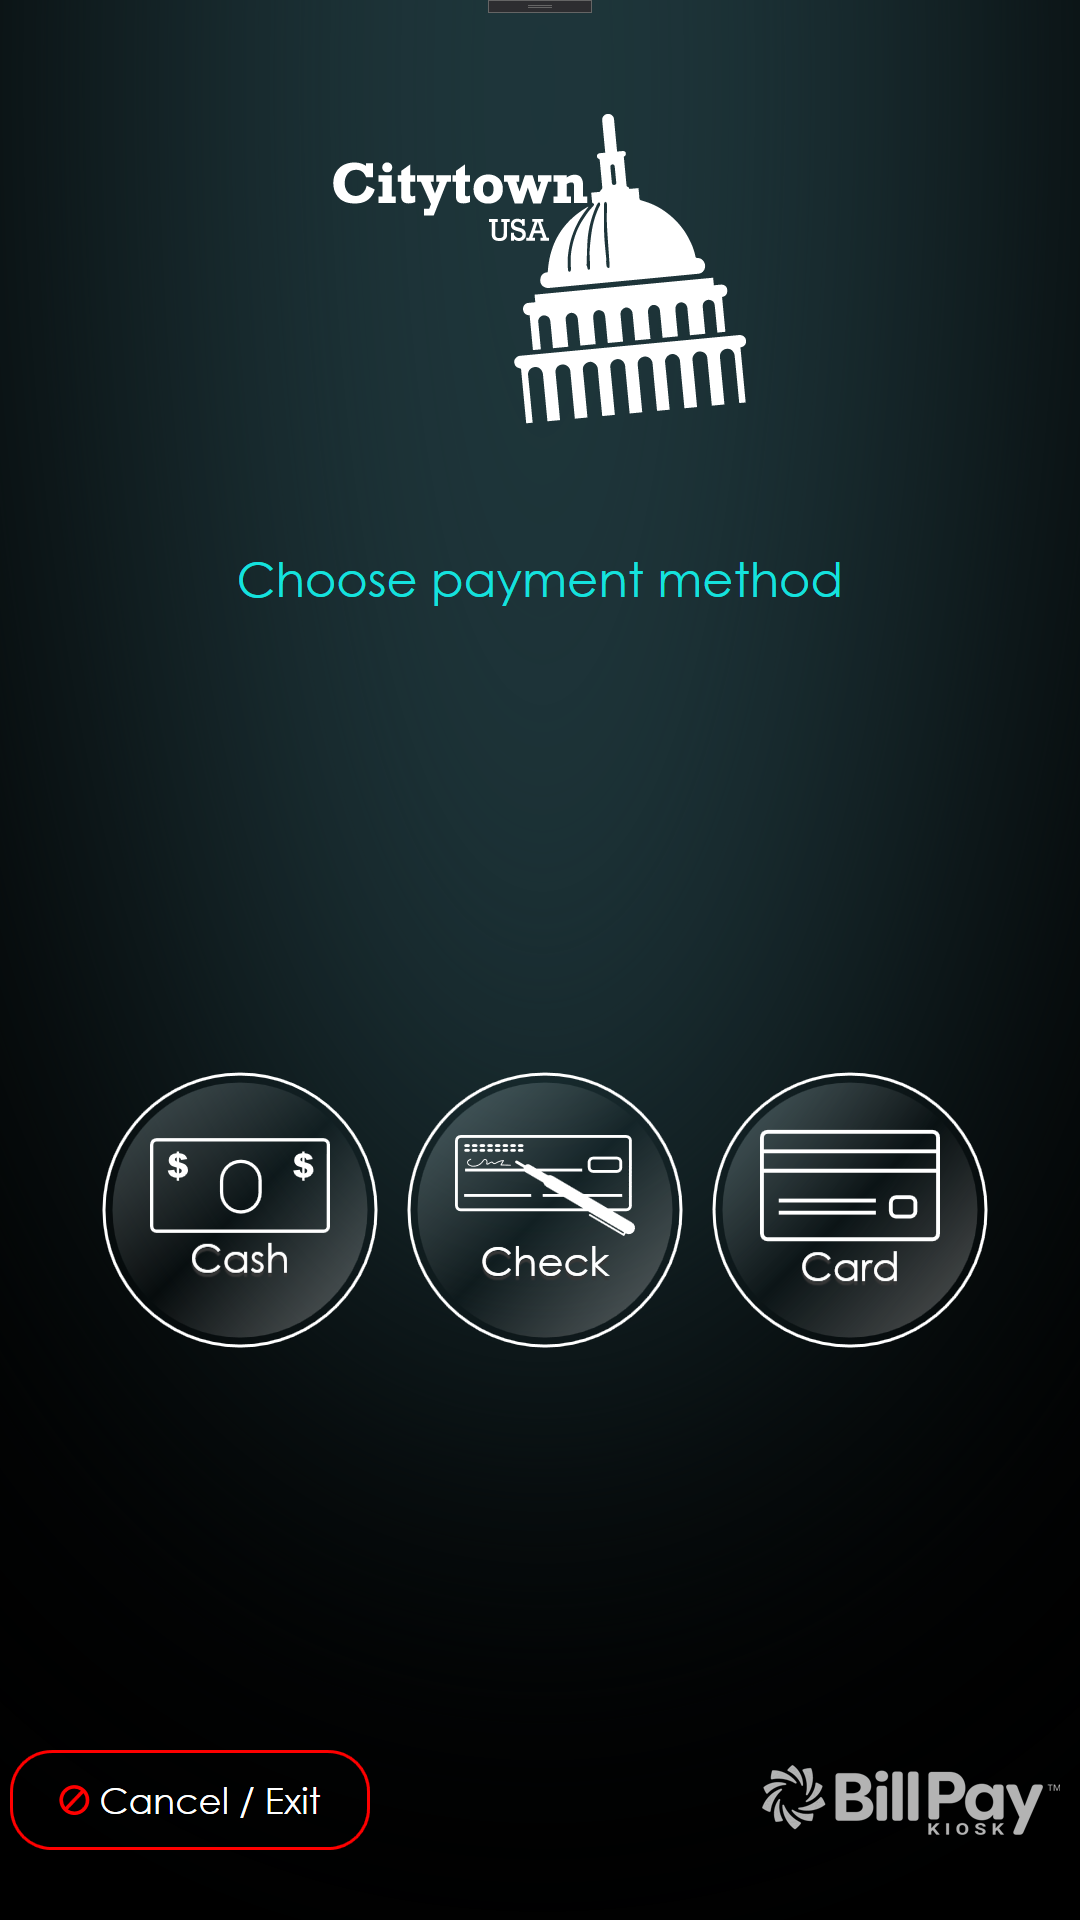 BillPay Kiosk™: Allows Cash, Check, and Credit/Debit Card Payments